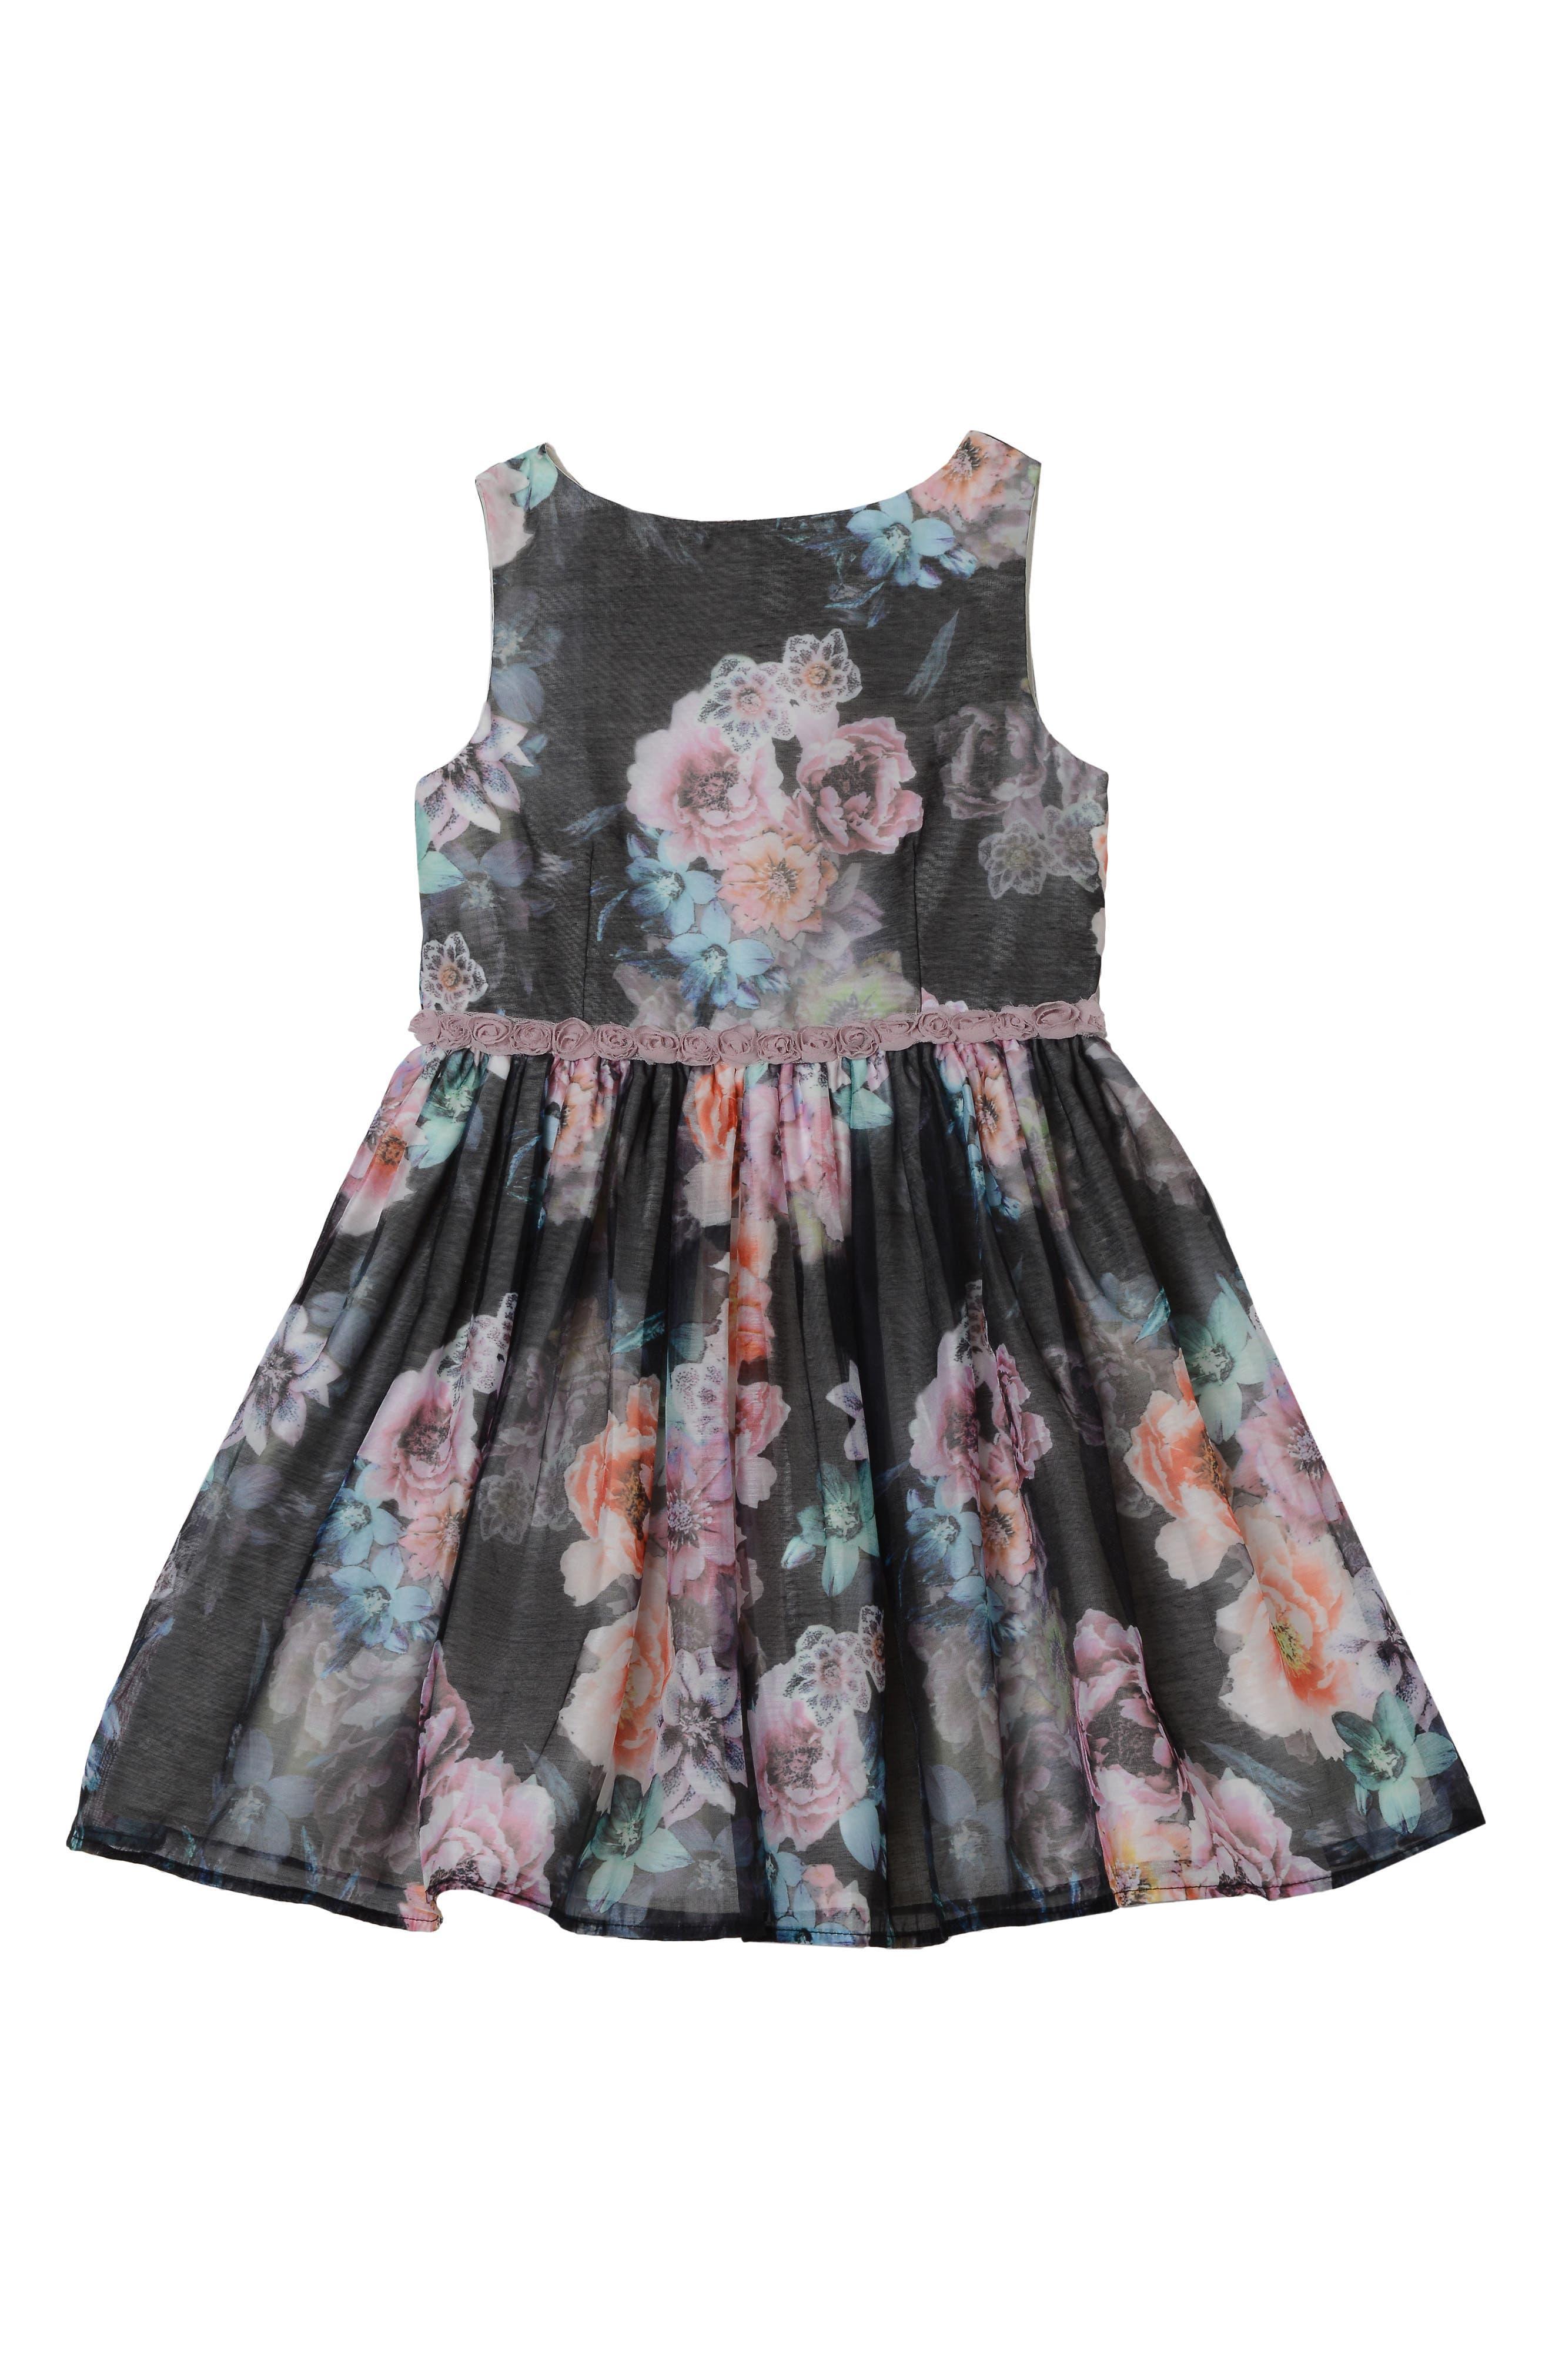 5bfff83773 Infant Girl s Pastourelle By Pippa   Julie Floral Print Dress